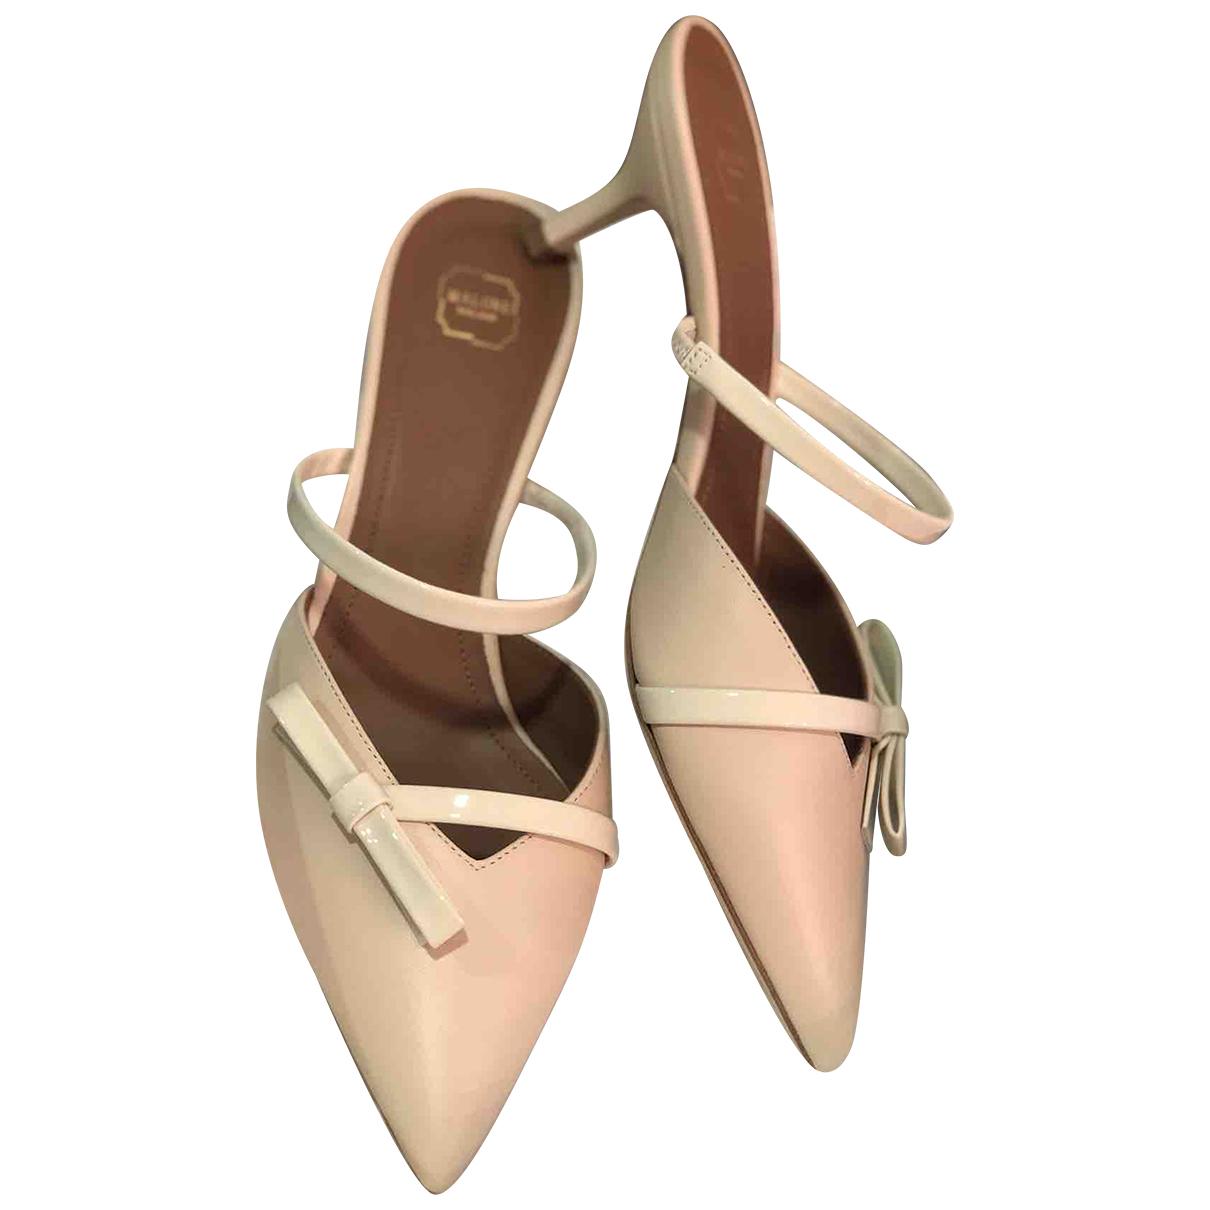 Malone Souliers \N Beige Leather Sandals for Women 38.5 EU